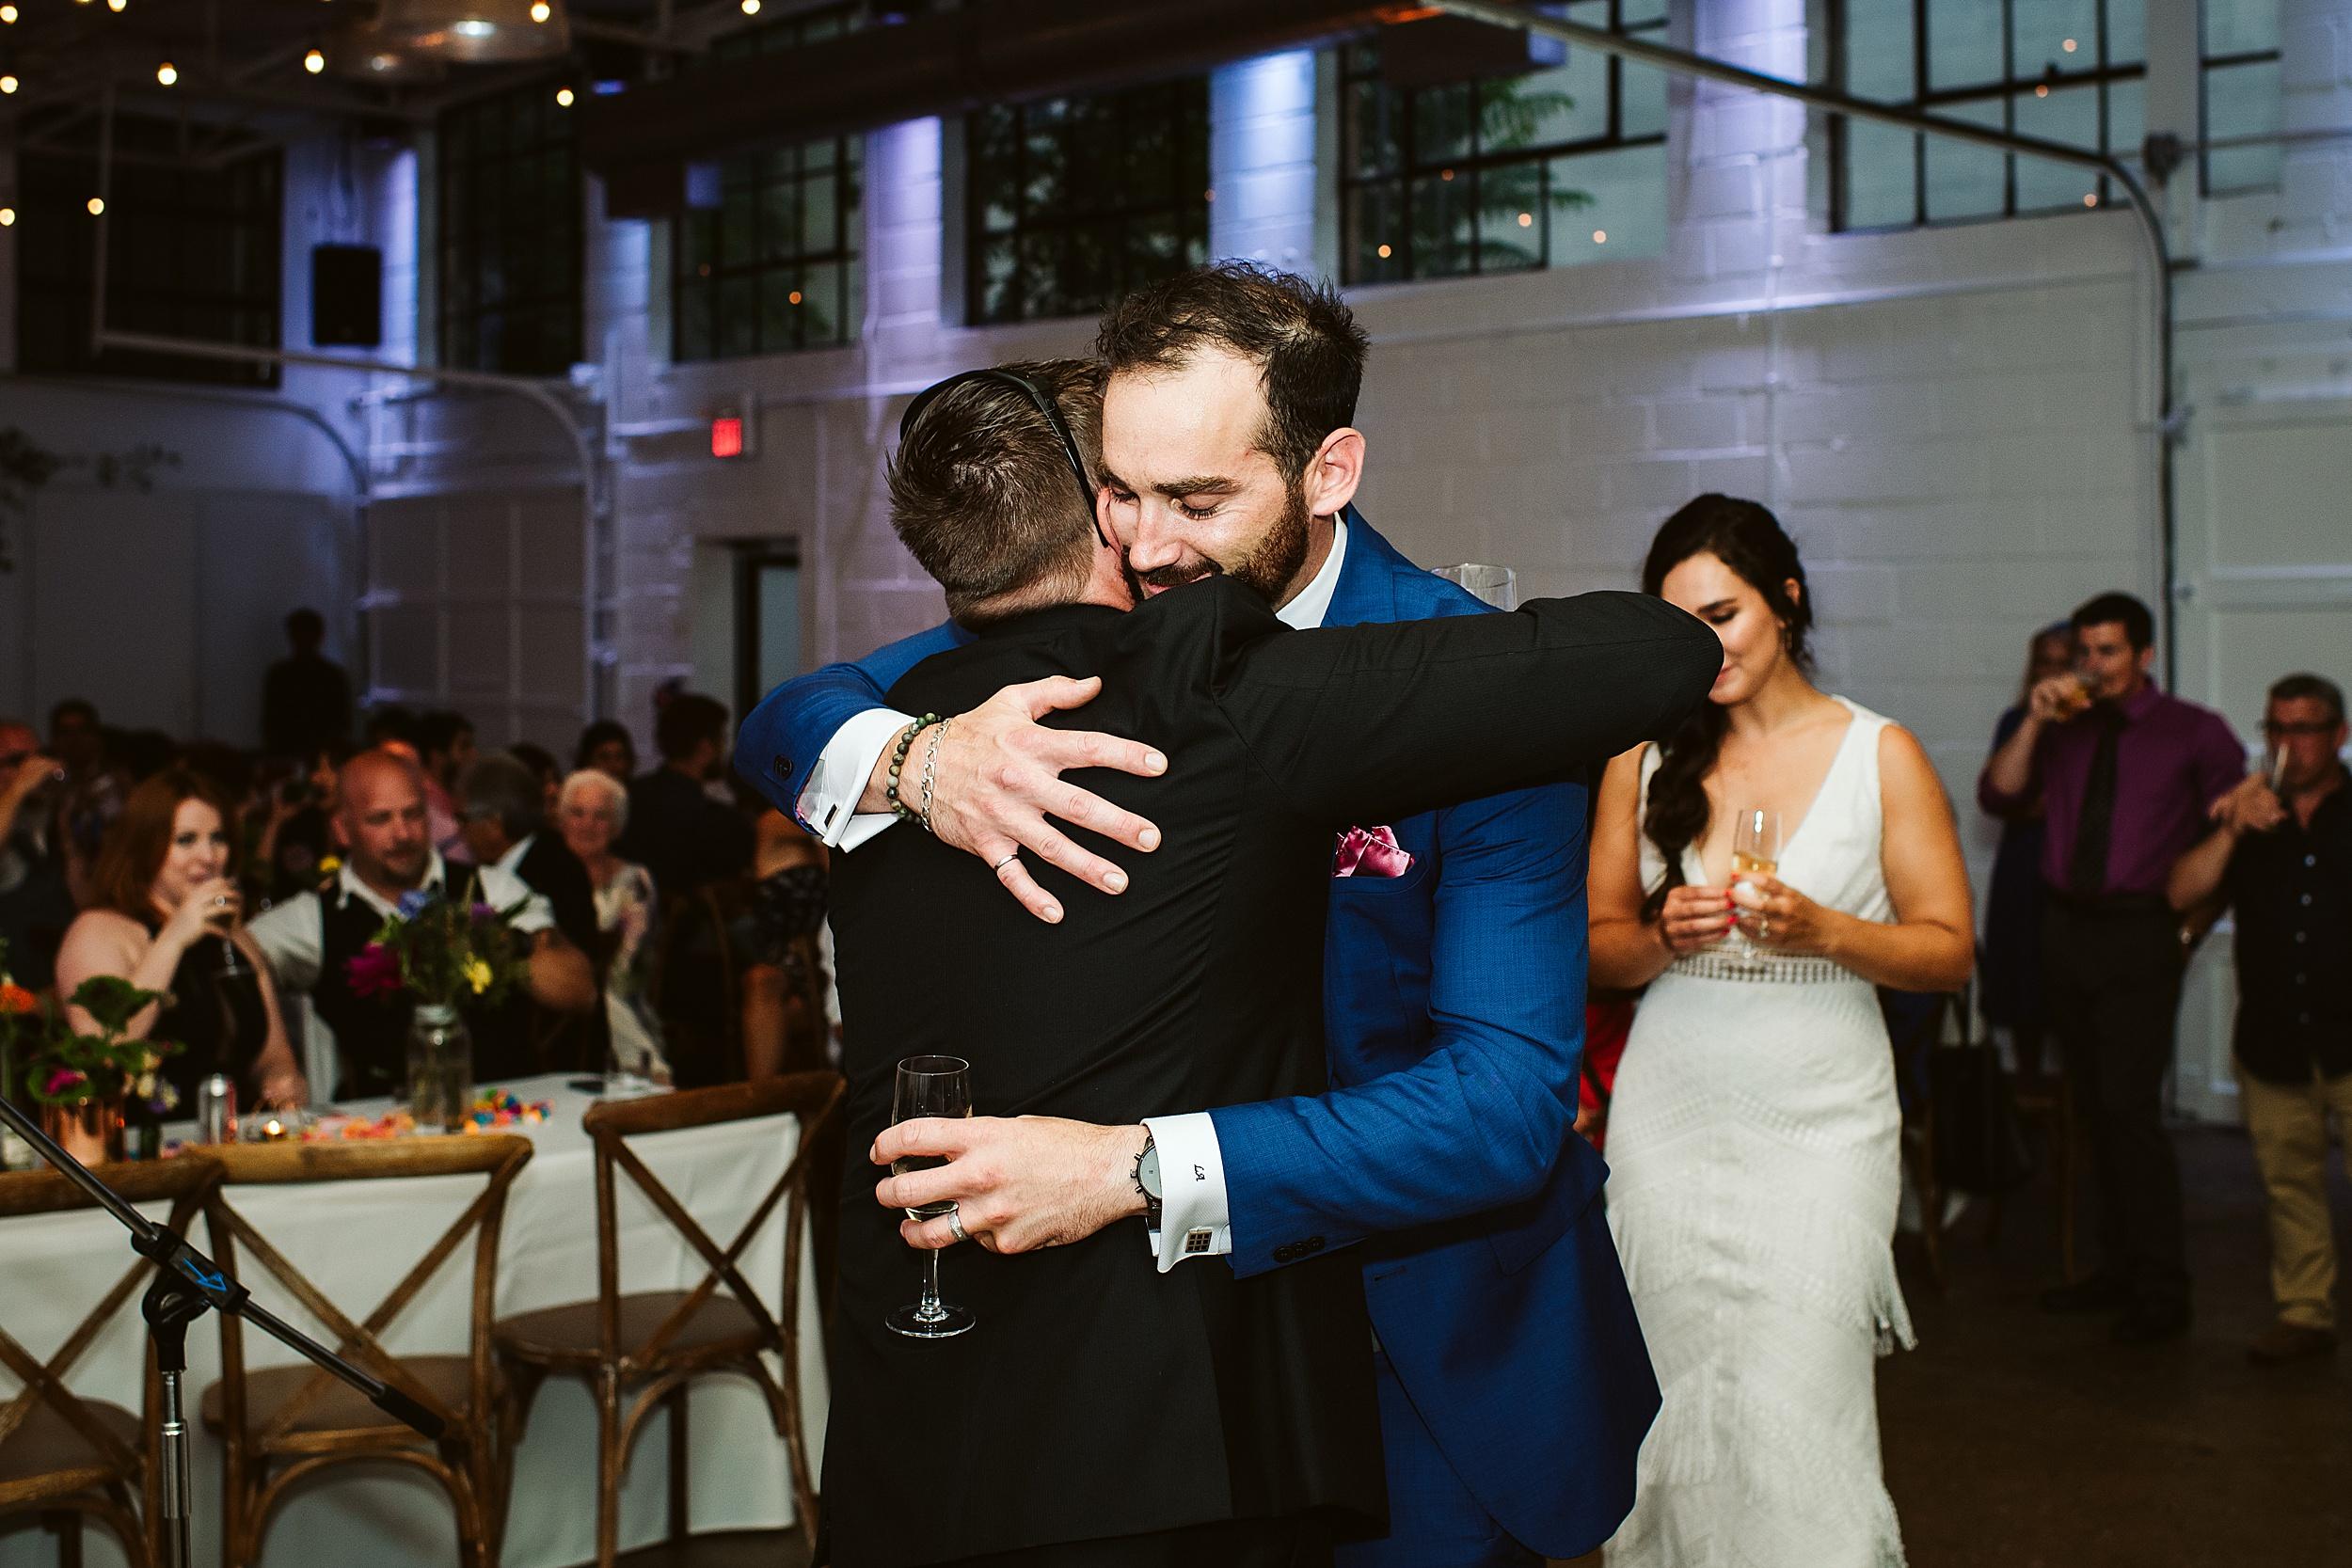 Airship-37-Berkeley-Events-Distillery-District-Wedding-Toronto-Wedding-Photographers_0089.jpg